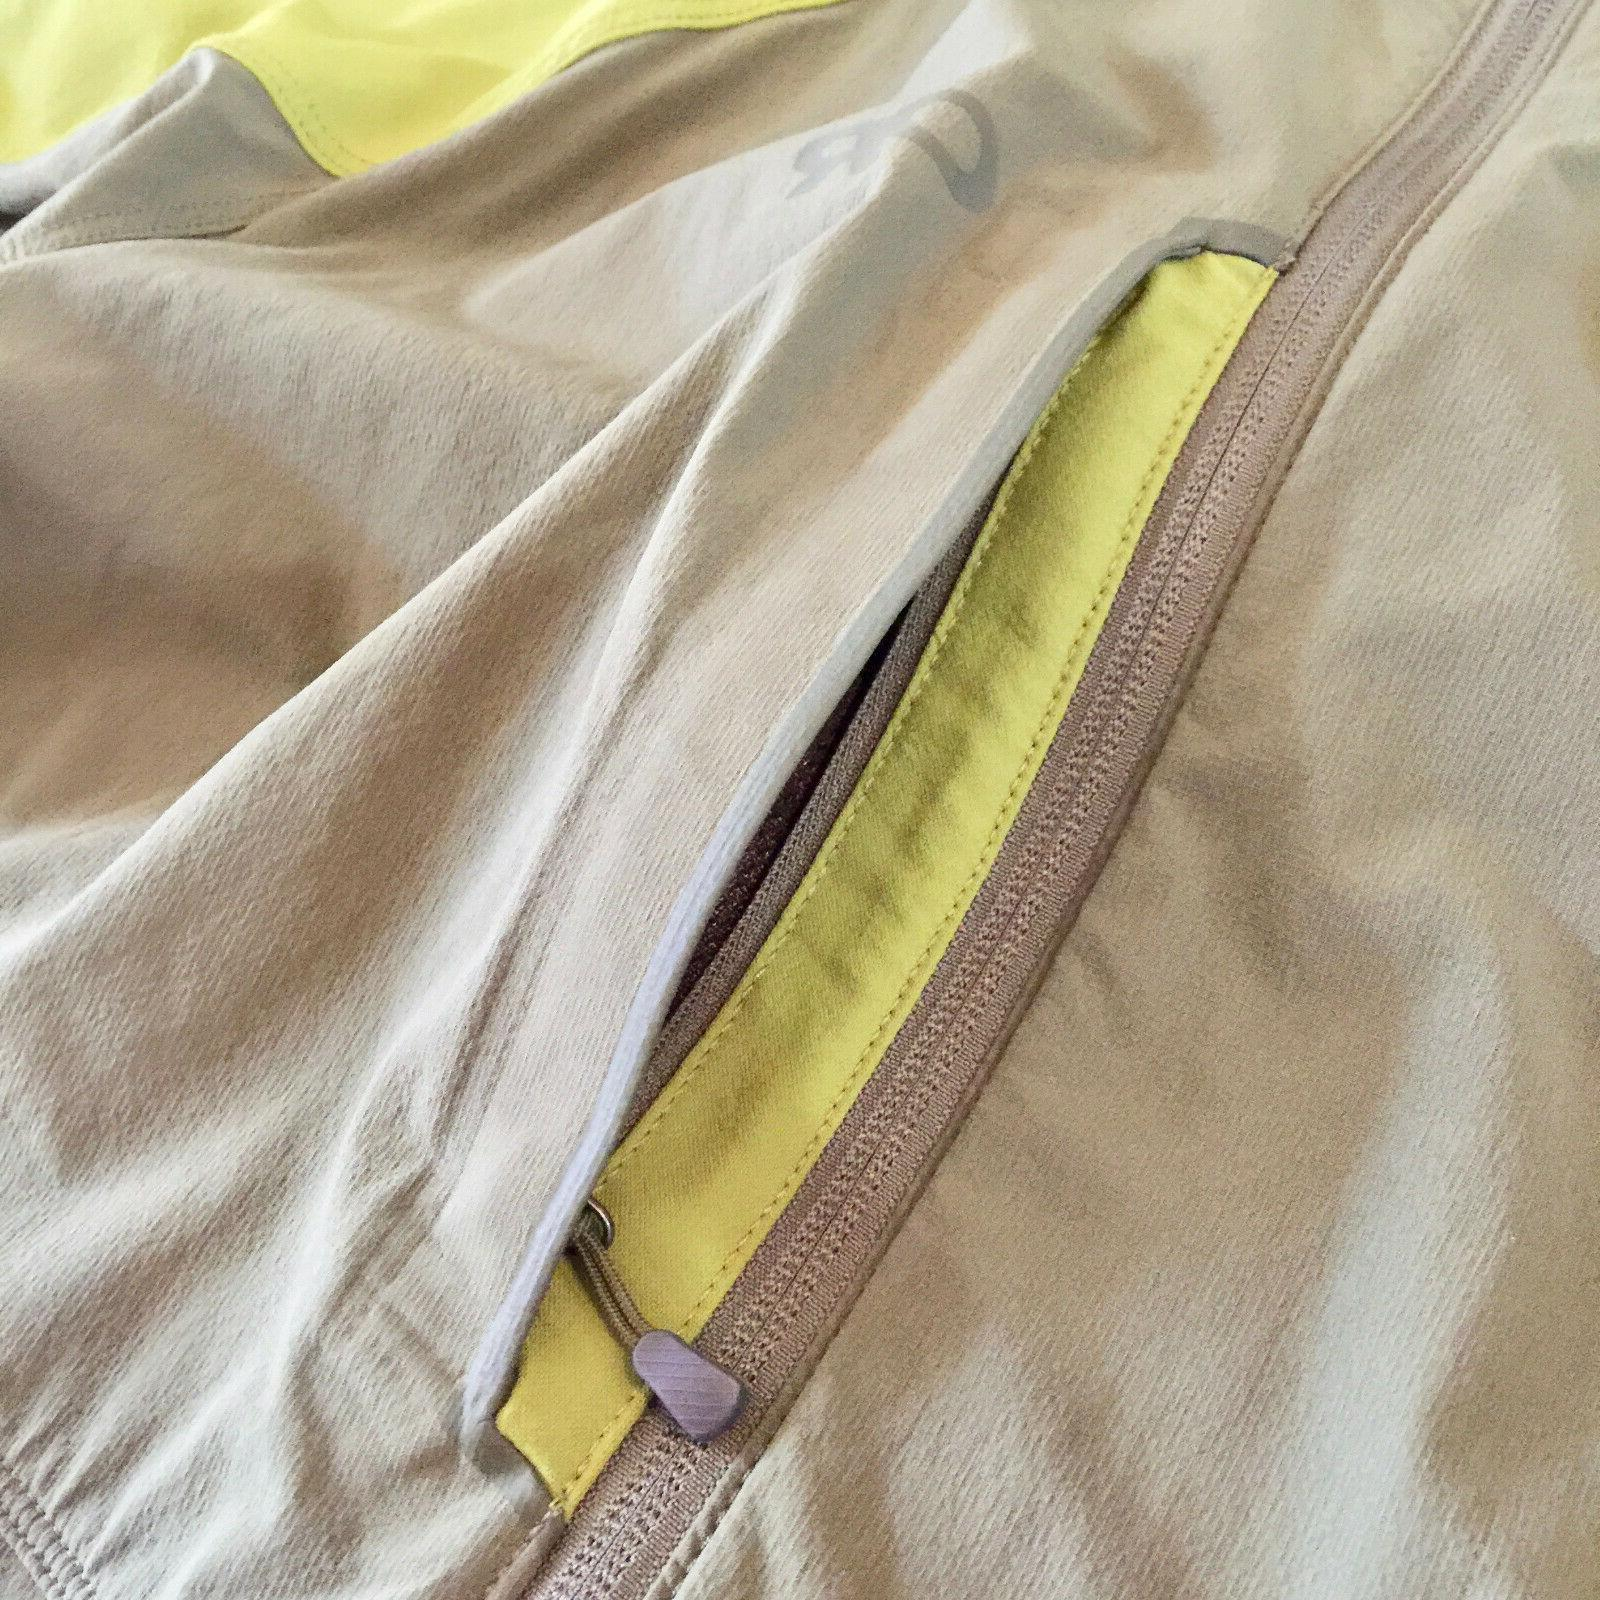 Outdoor Research Ferrosi Jacket Stretchy Medium,